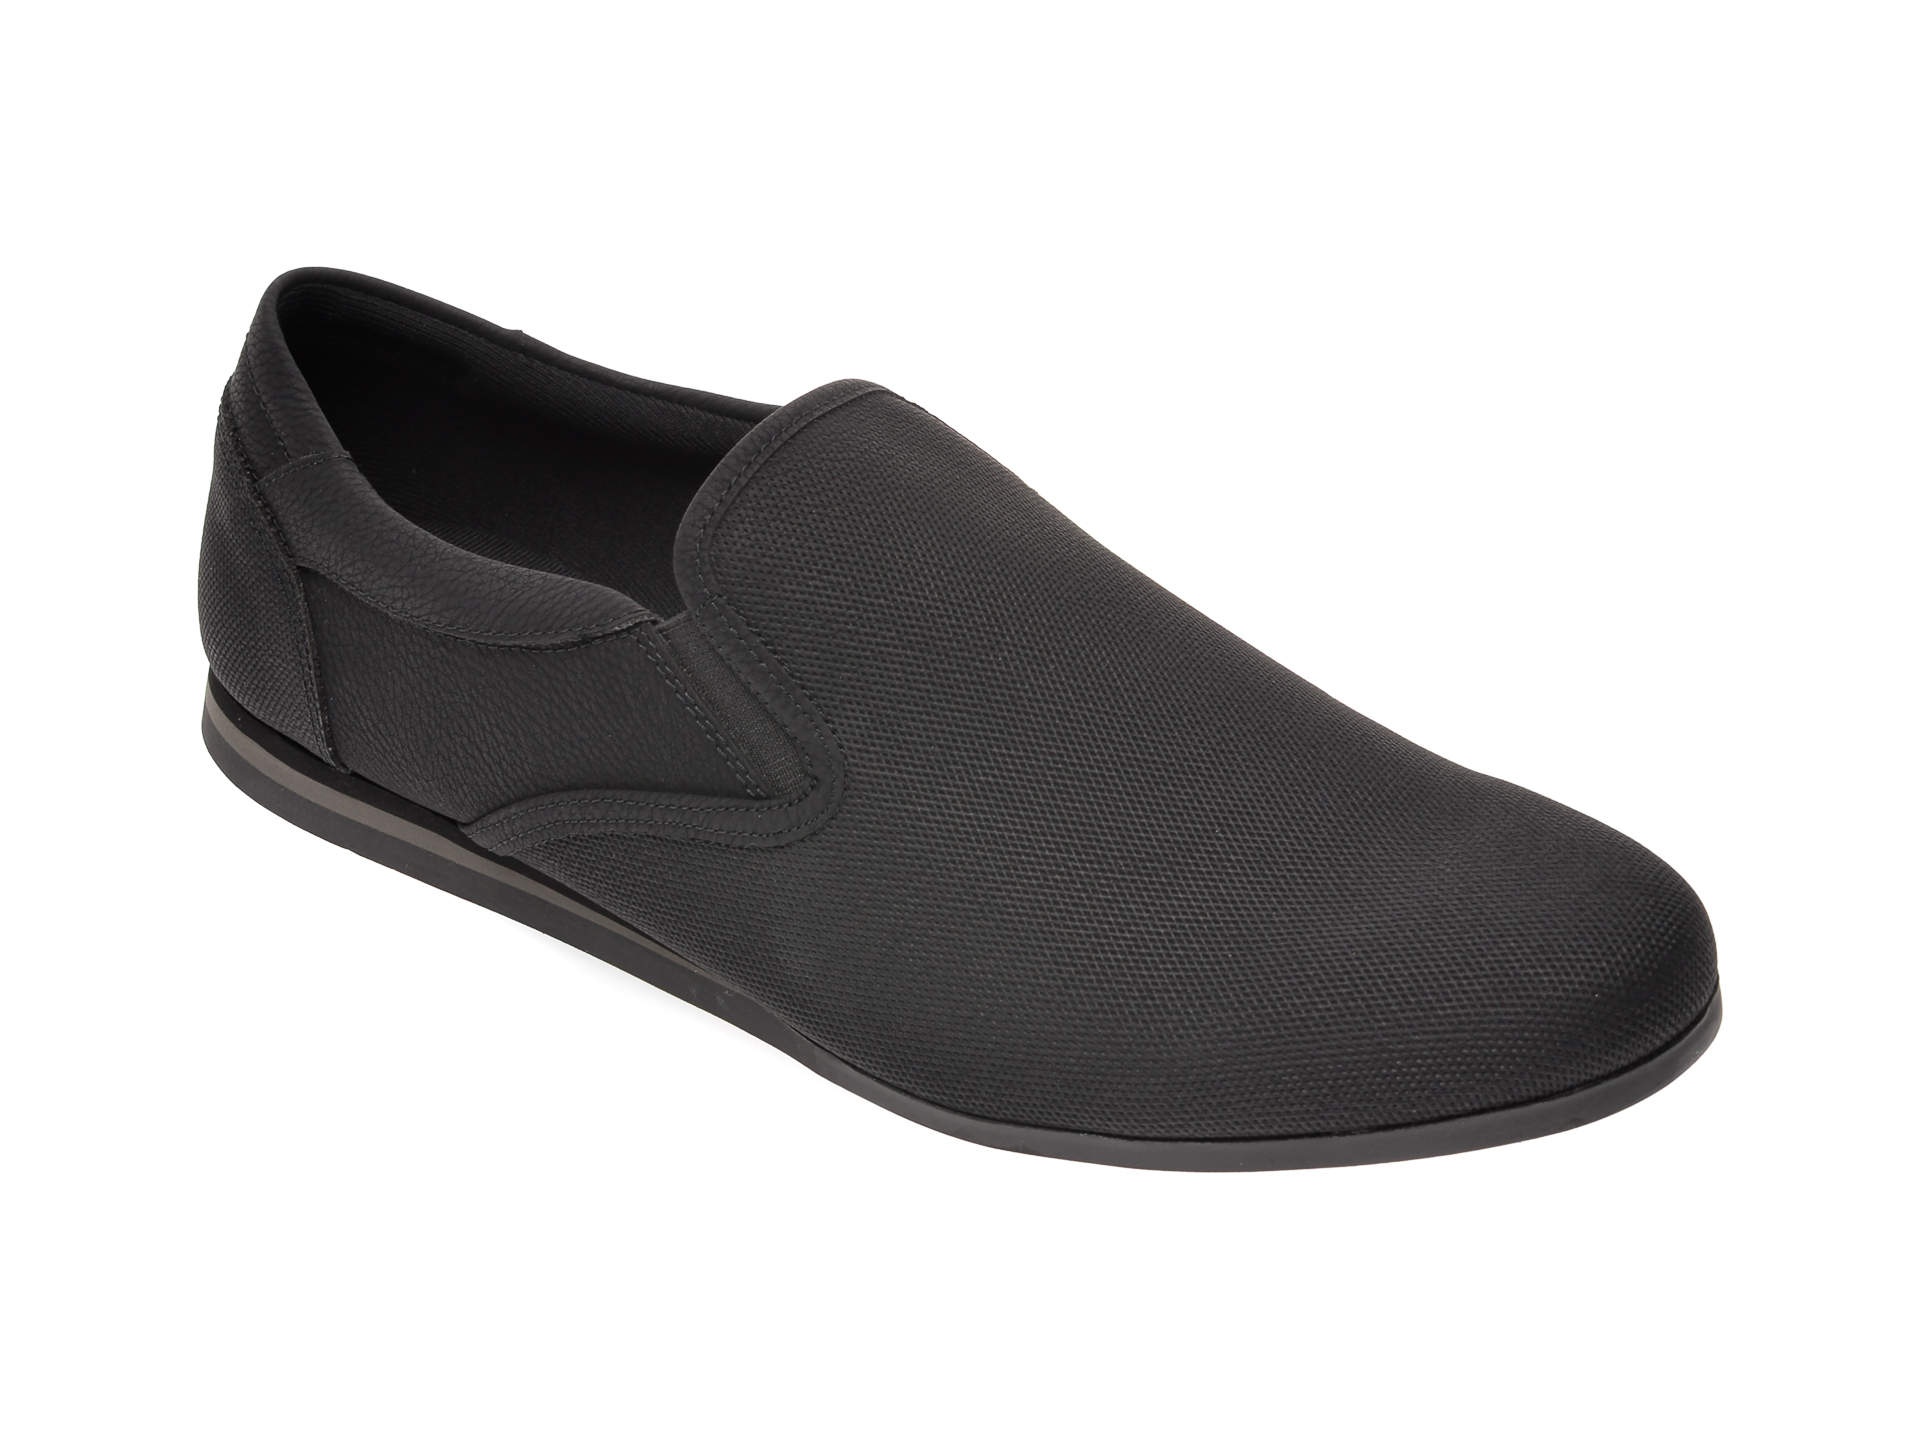 Pantofi ALDO negri, Brezo008, din piele ecologica imagine